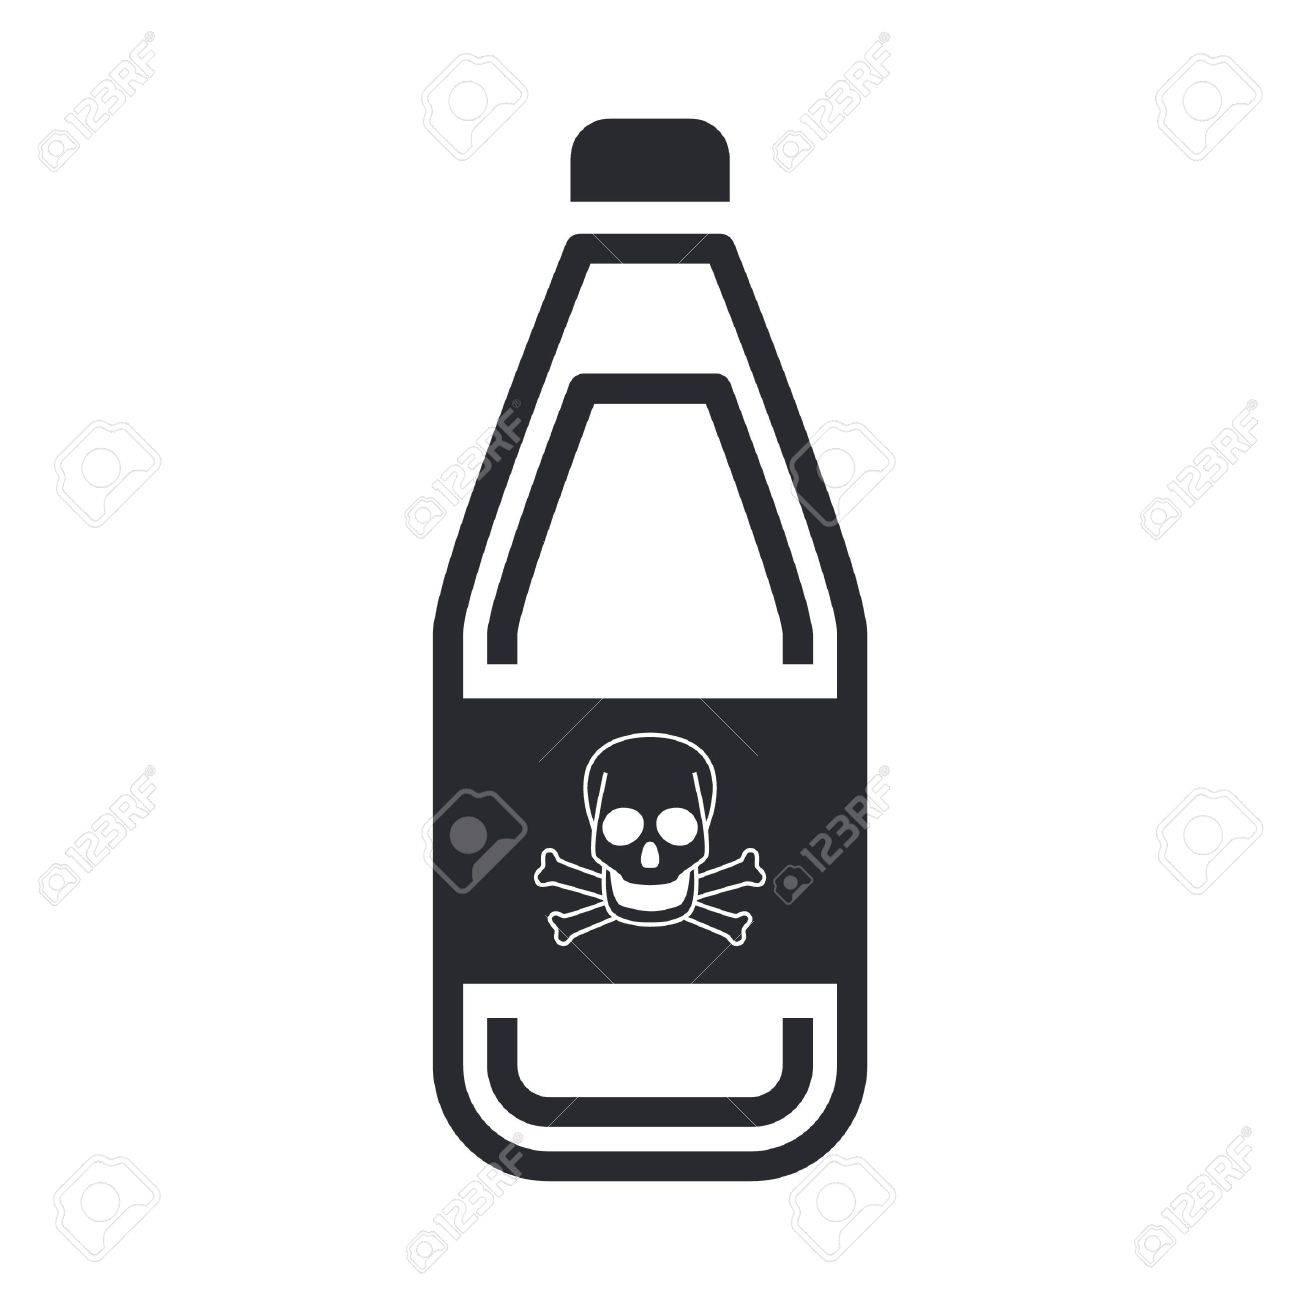 Vector illustration of single isolated dangerous bottle icon Stock Vector - 12119872